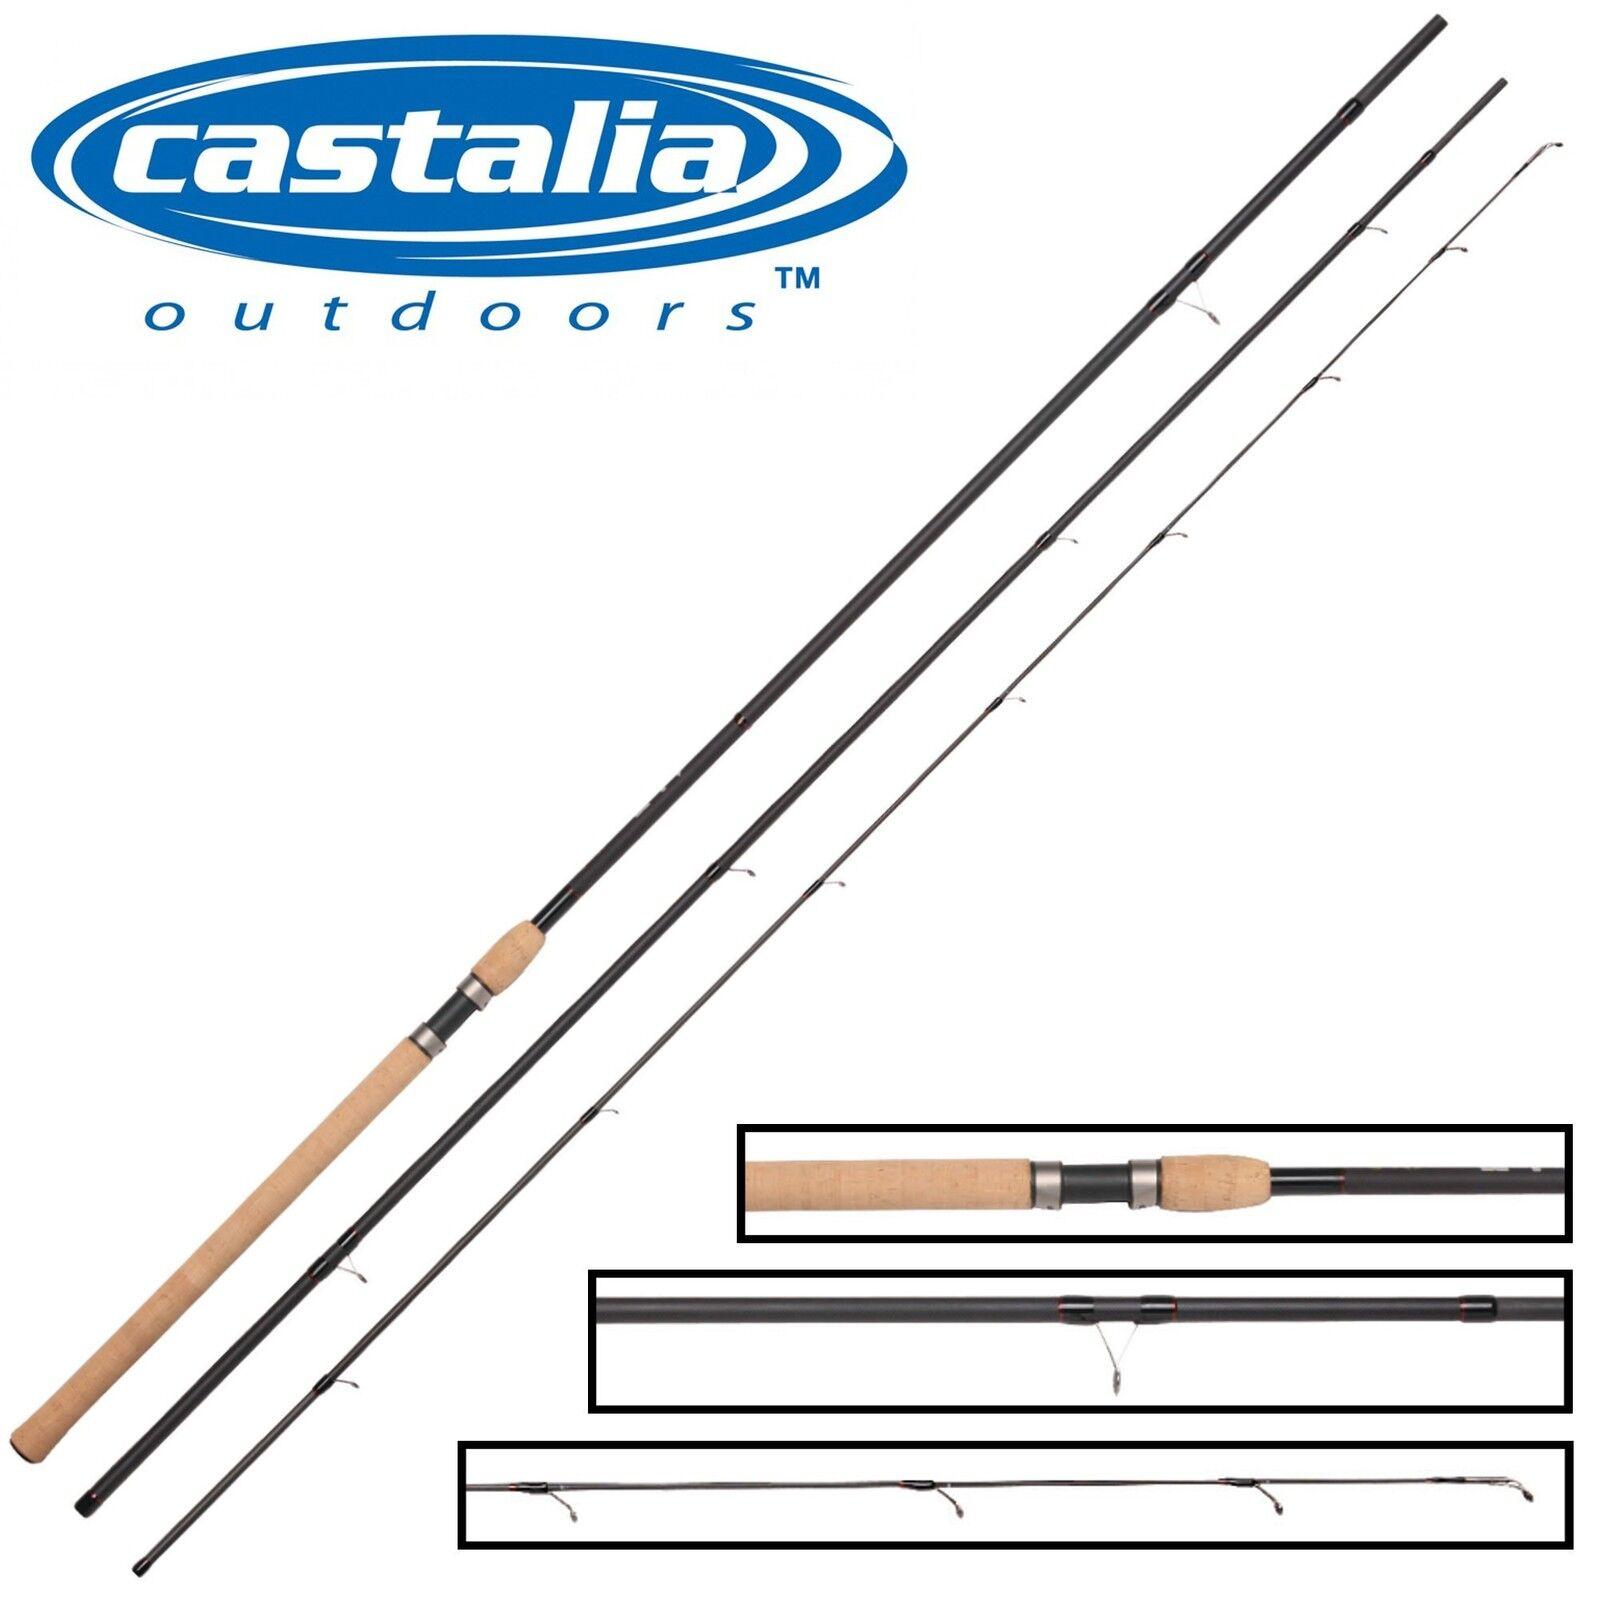 Castalia Match Pro 390cm 1-12g - Matchrute Friedfischrute Posenrute Angelrute